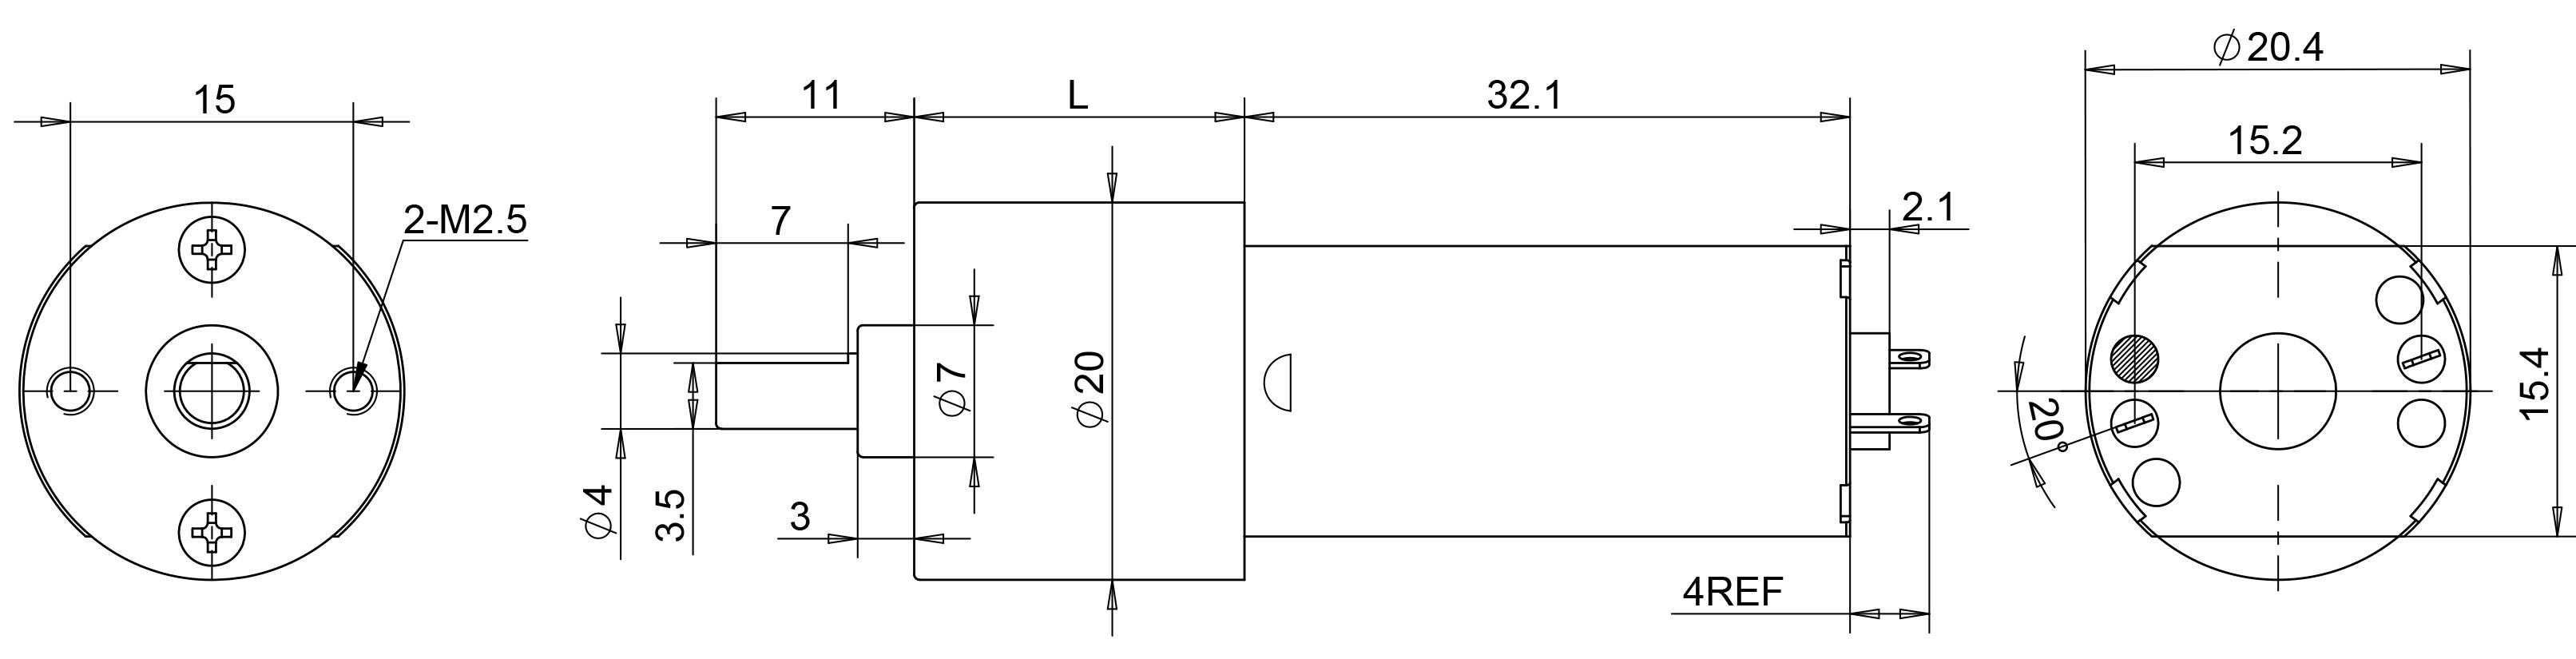 drawing of gear motor